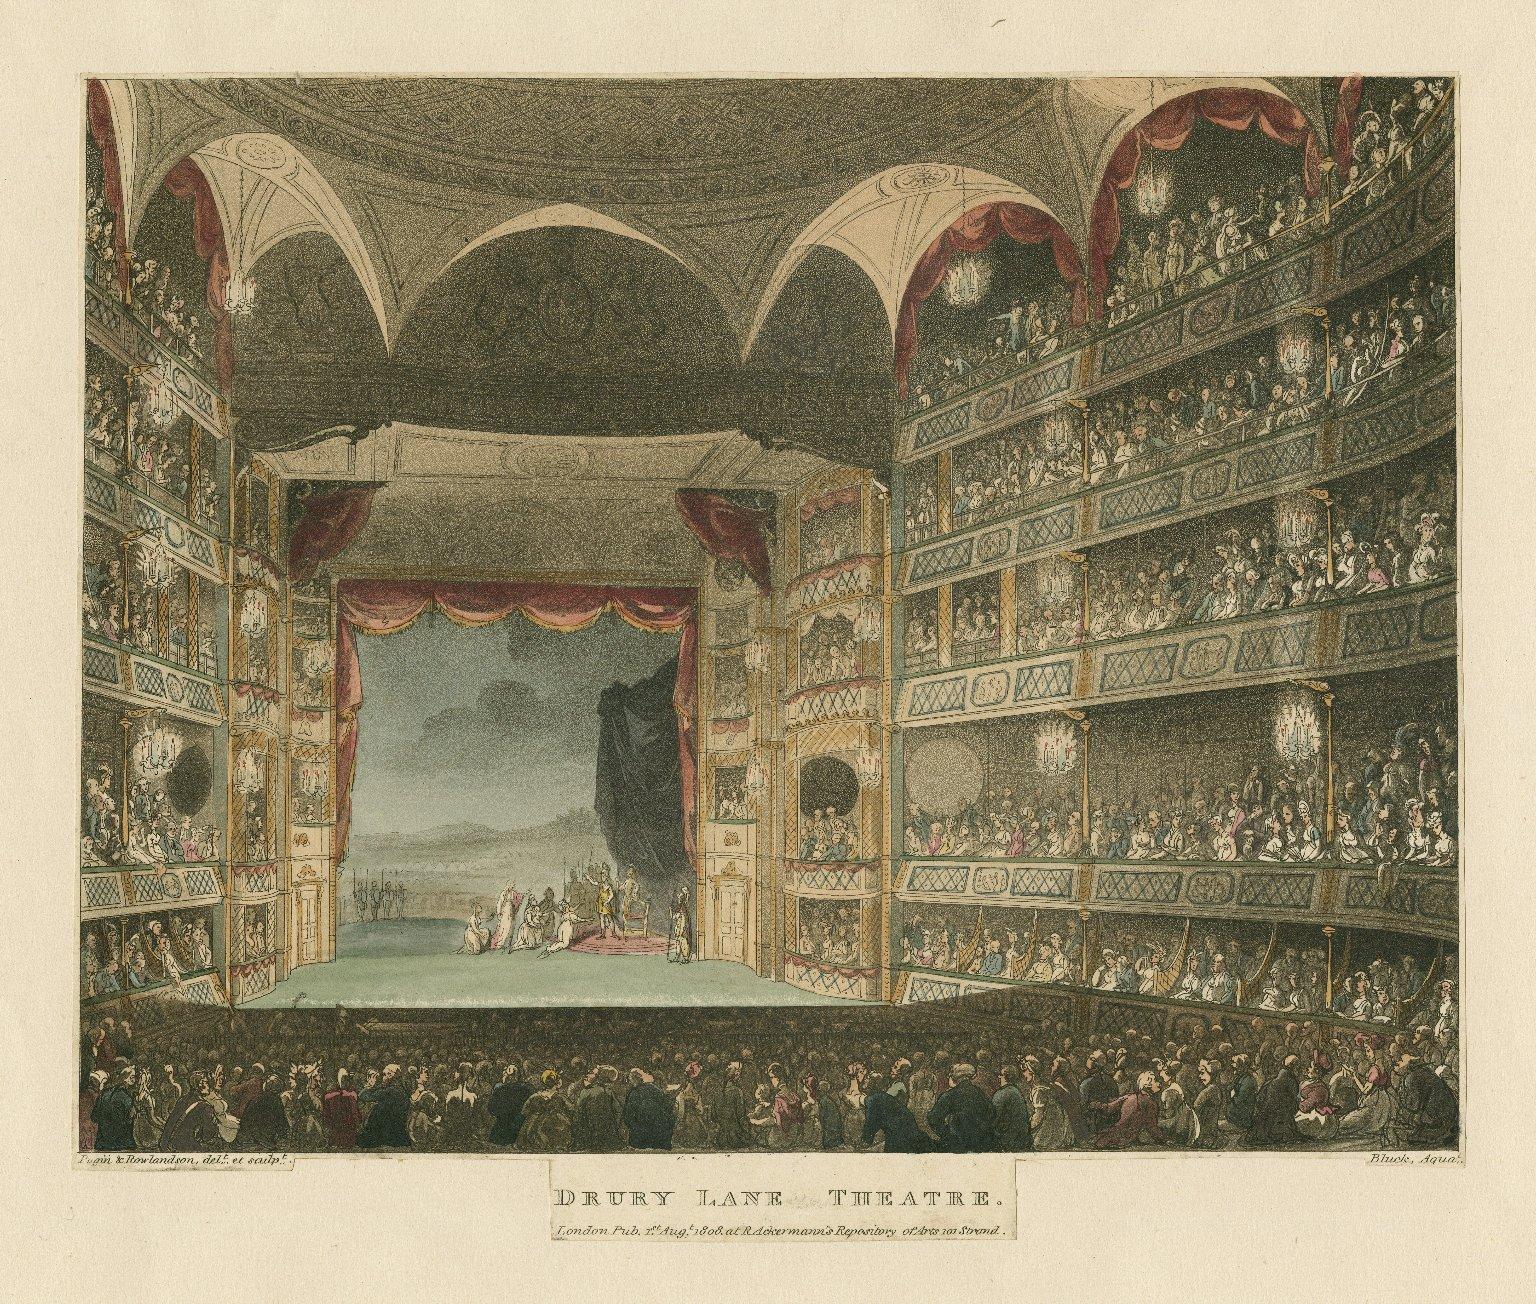 Drury Lane Theatre [graphic] / Pugin & Rowlandson, delt. et sculpt. ; Bluck, aquat.